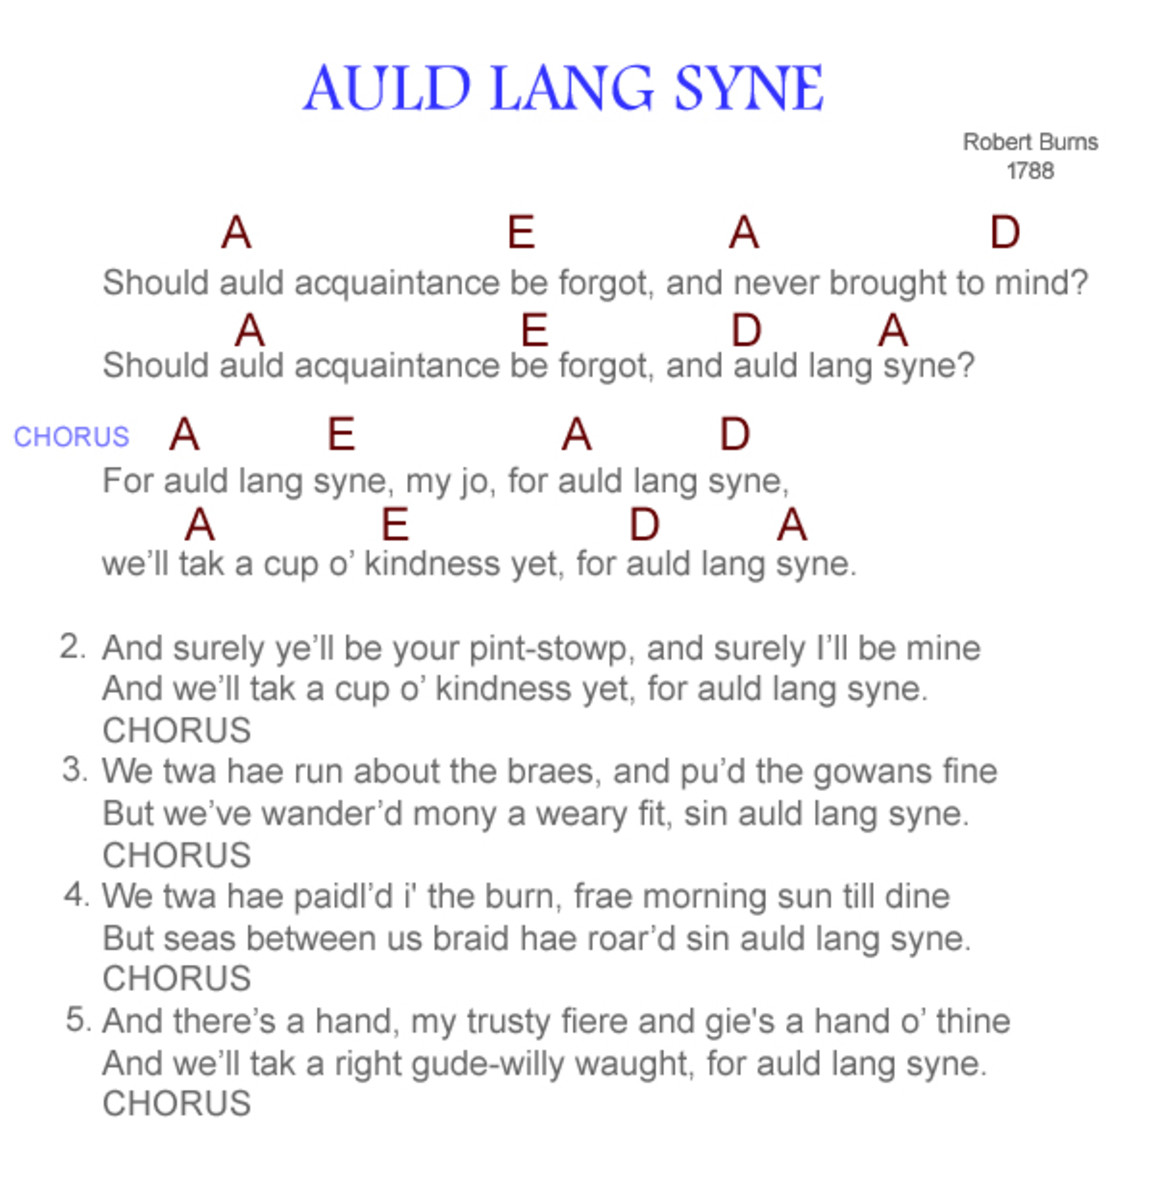 Auld Lang Syne - chords and lyrics